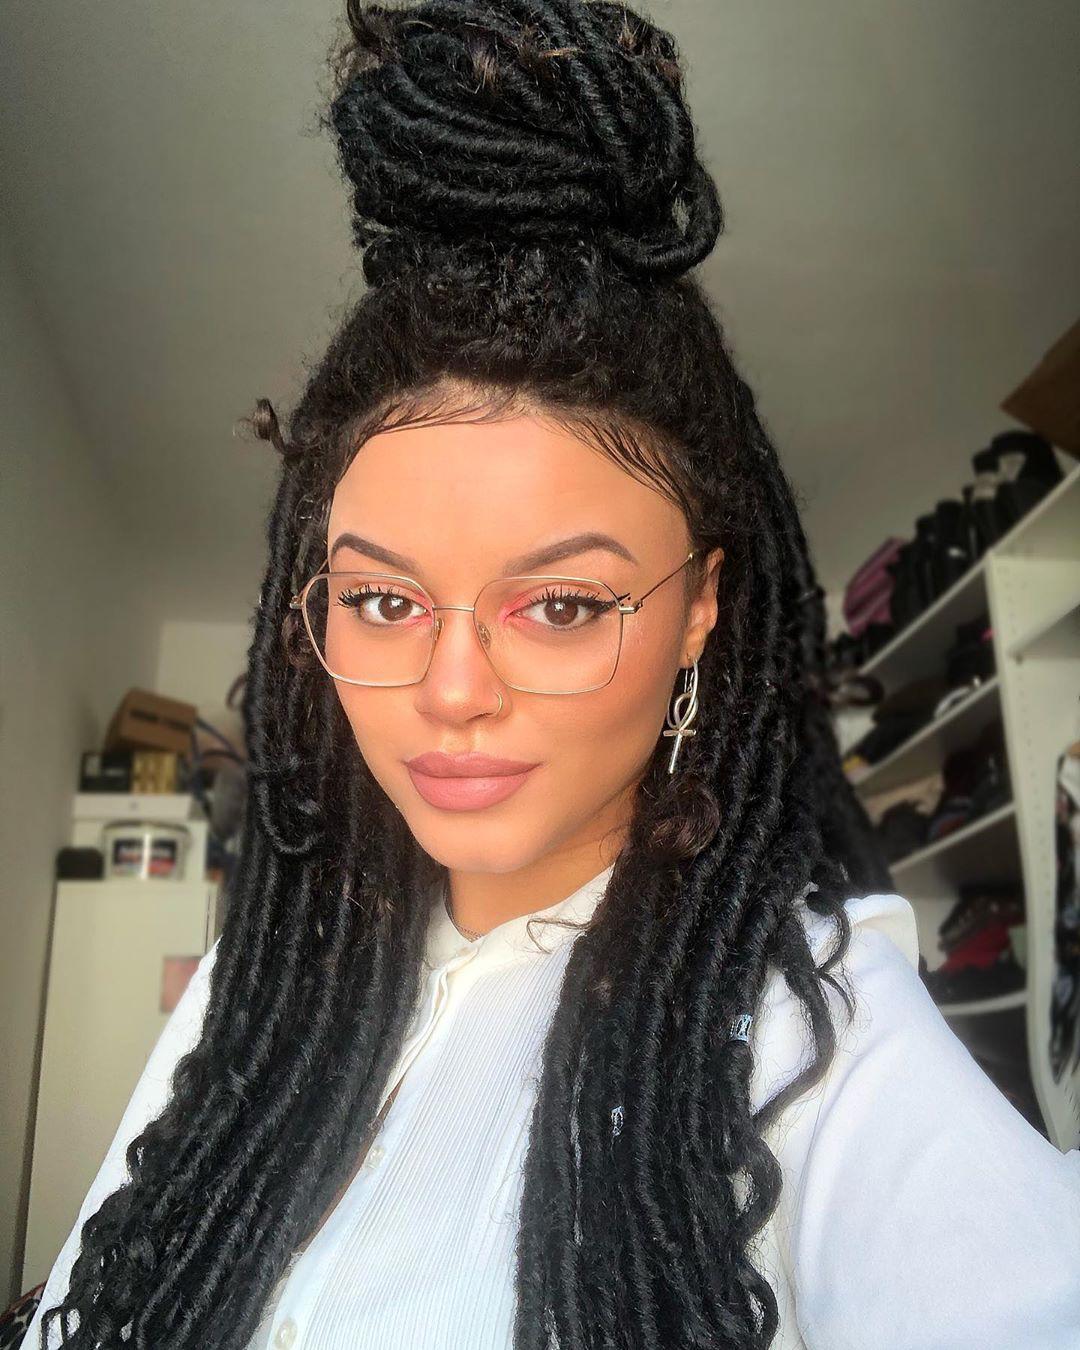 Sina Iuna Braid Outfits For Girls Black Natural Hair Hairstyles